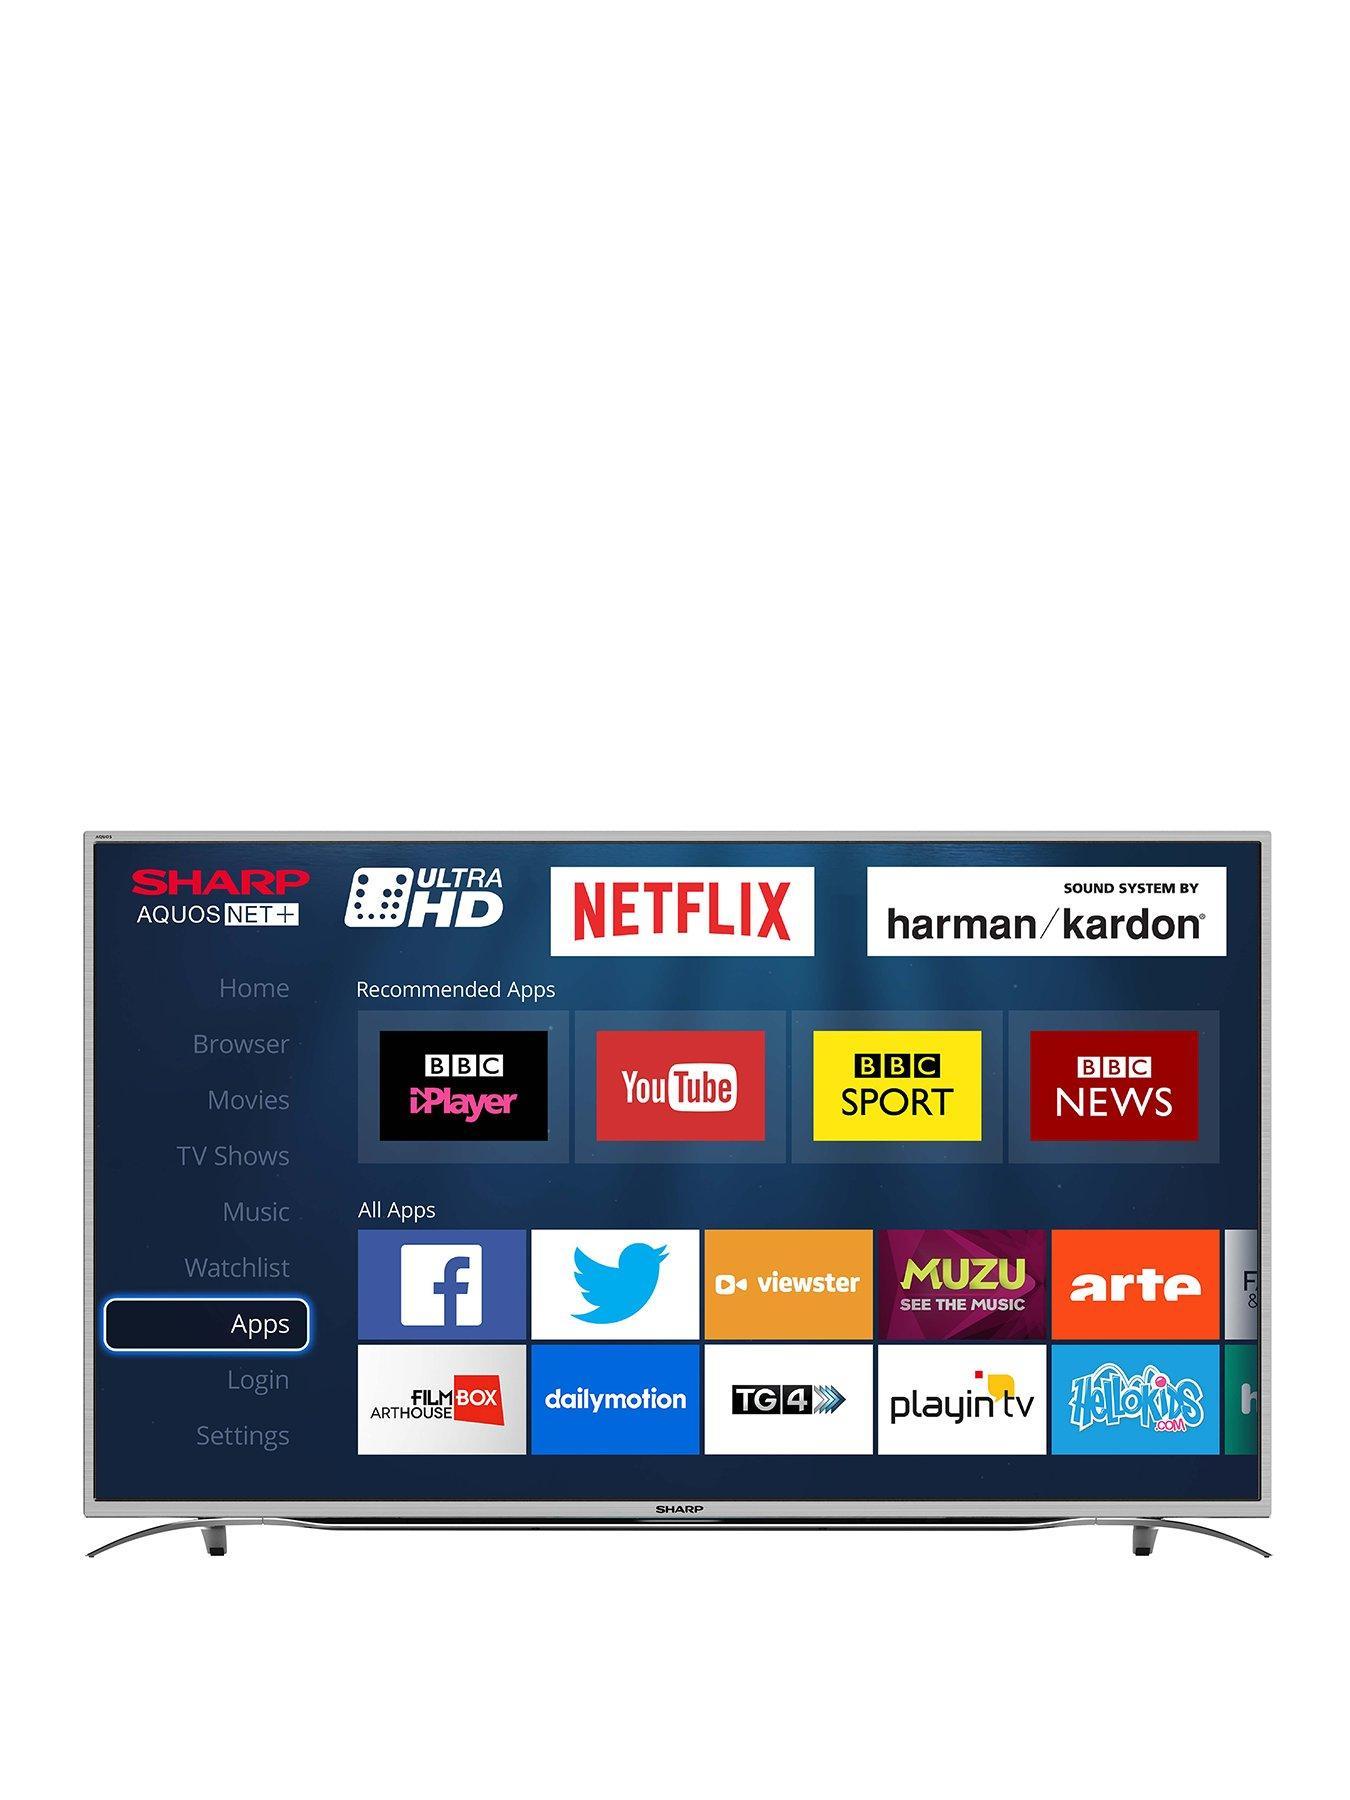 sharp 55 inch lc 55cug8052k 4k ultra hd smart led tv. sharp lc-55cug8362ks 55 inch, 4k ultra hd certified, smart tv - black | very.co.uk inch lc 55cug8052k 4k hd led tv d